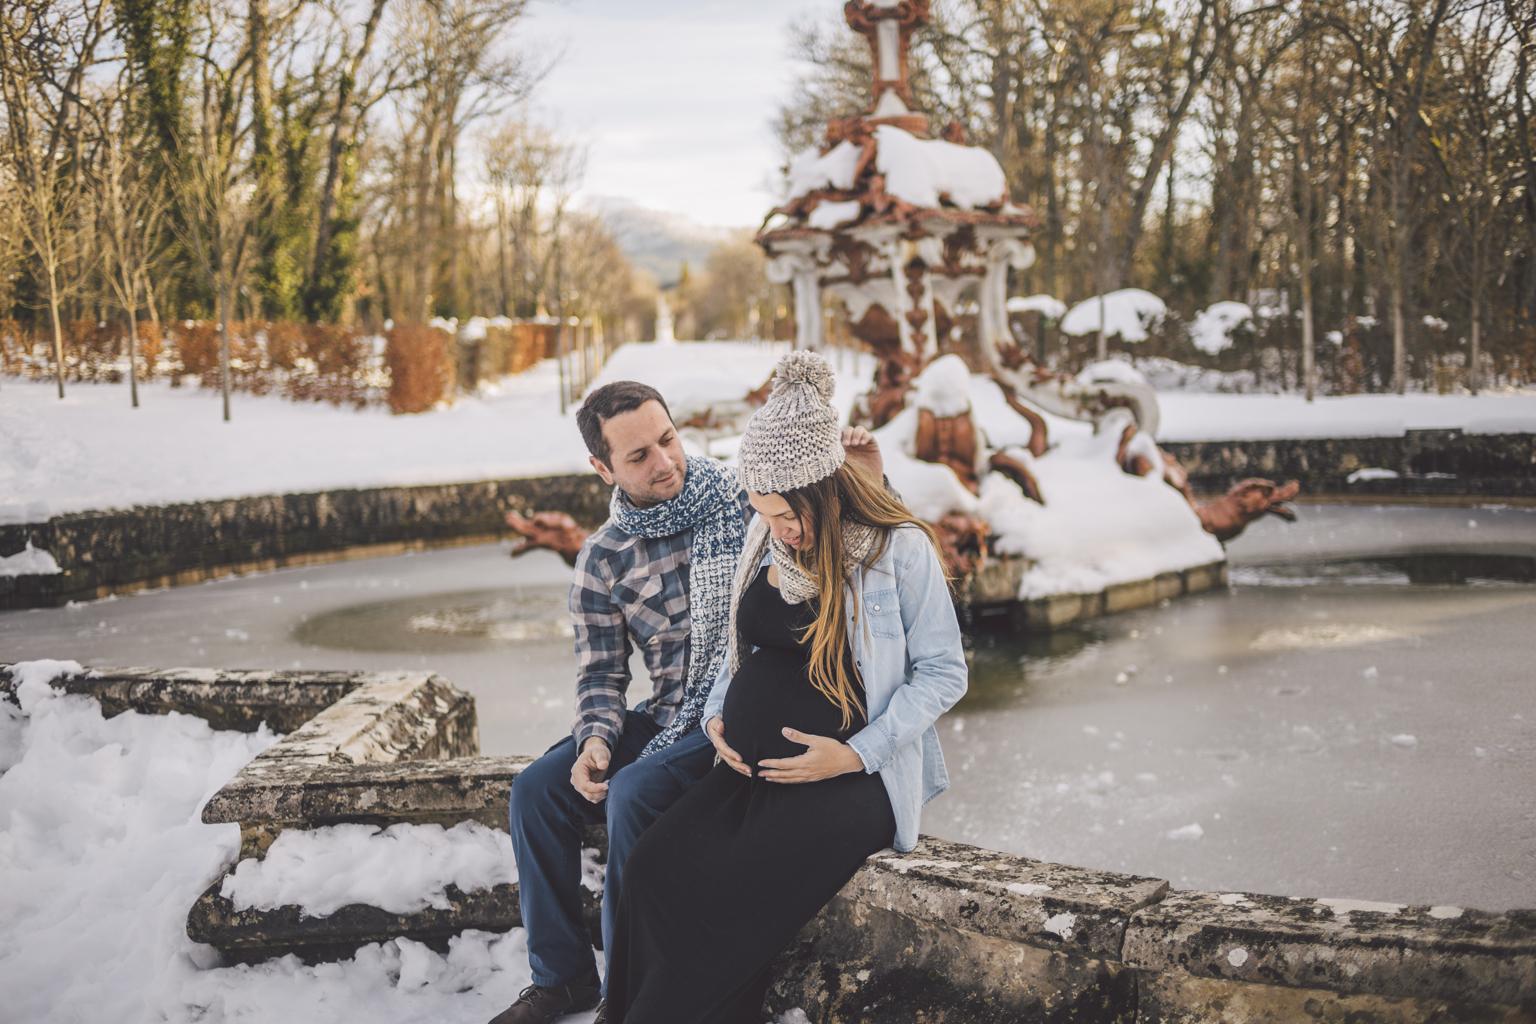 Fotógrafo de embarazo Madrid - Fotógrafo de embarazo en la nieve :: fotógrafo de embarazo la granja de san ildefonso :: fotografía de embarazo en la nieve Madrid